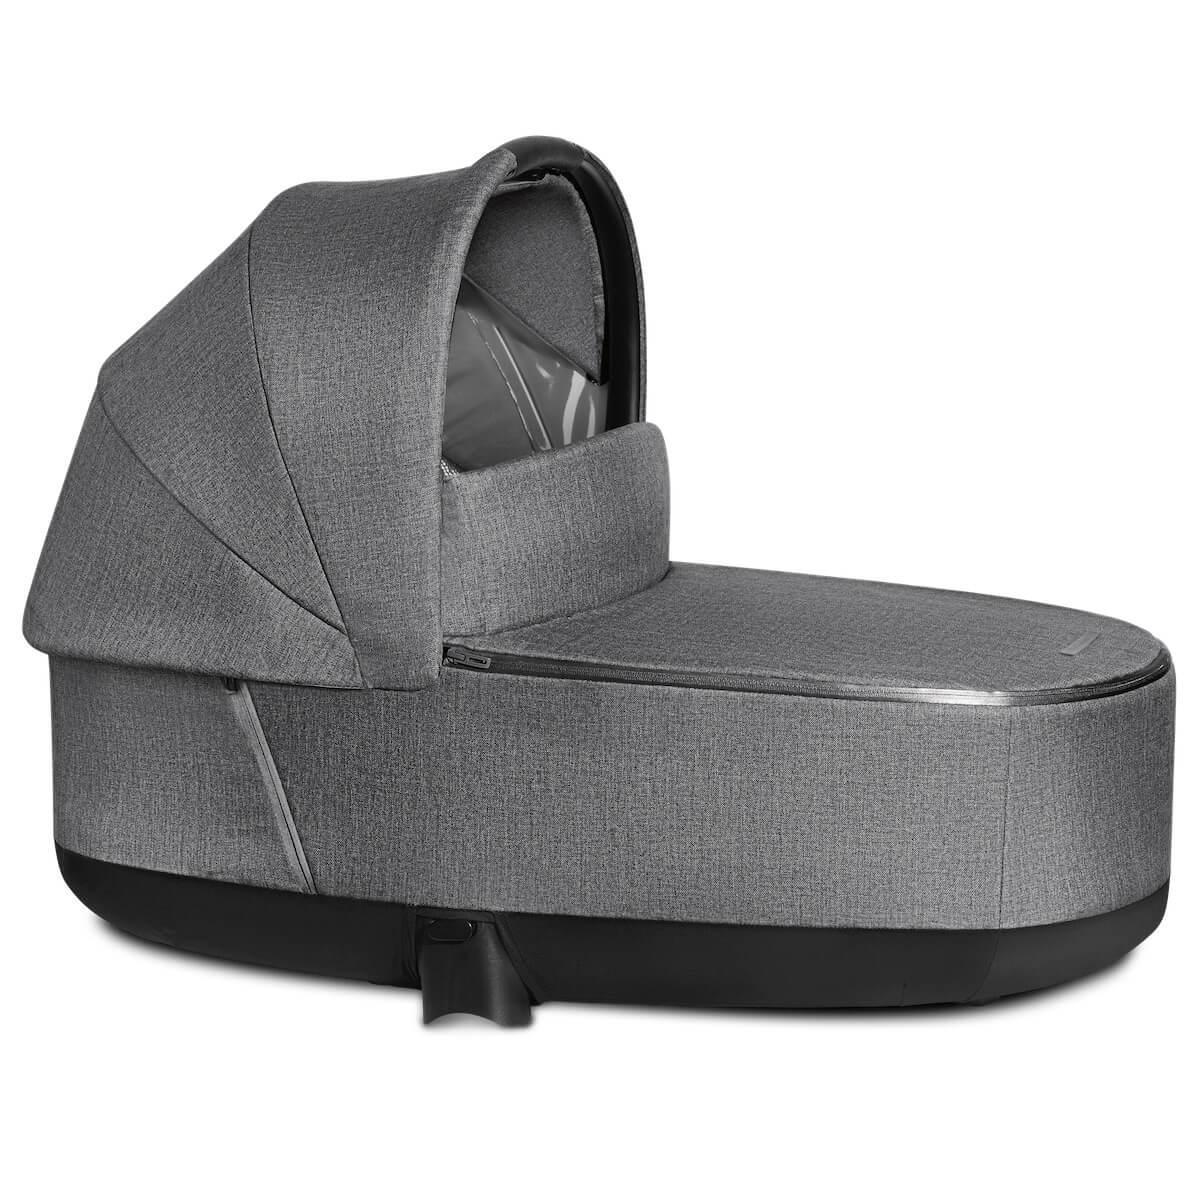 Capazo de luxe PRIAM Cybex Plus Manhattan Grey Plus-mid grey